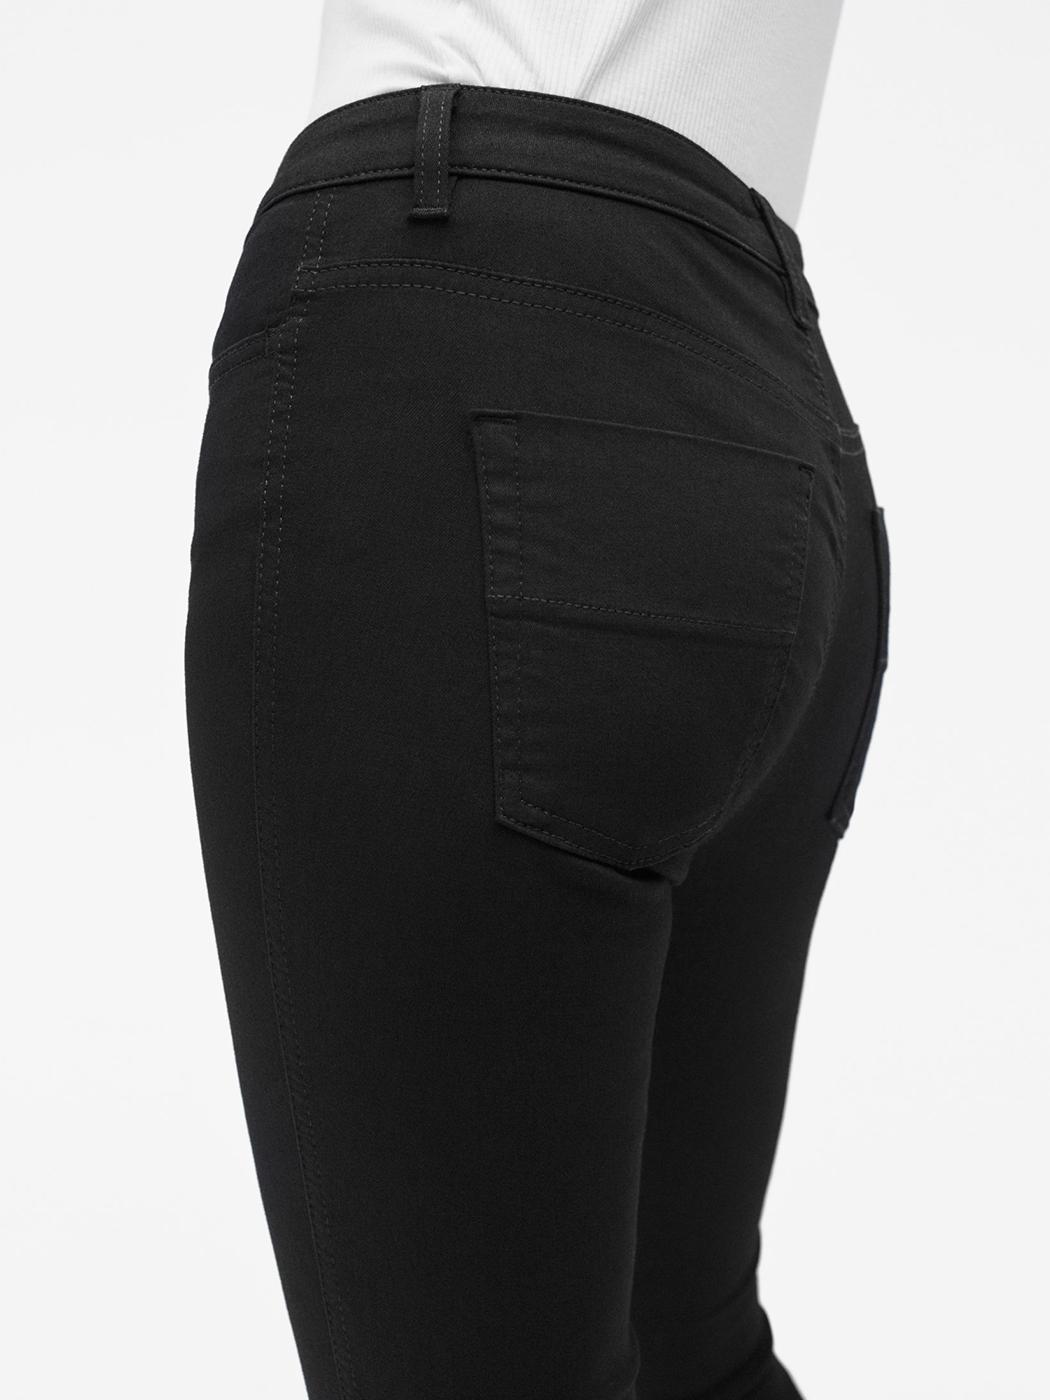 Lola Super Stretch Jean - Black - Filippa K - Side shot